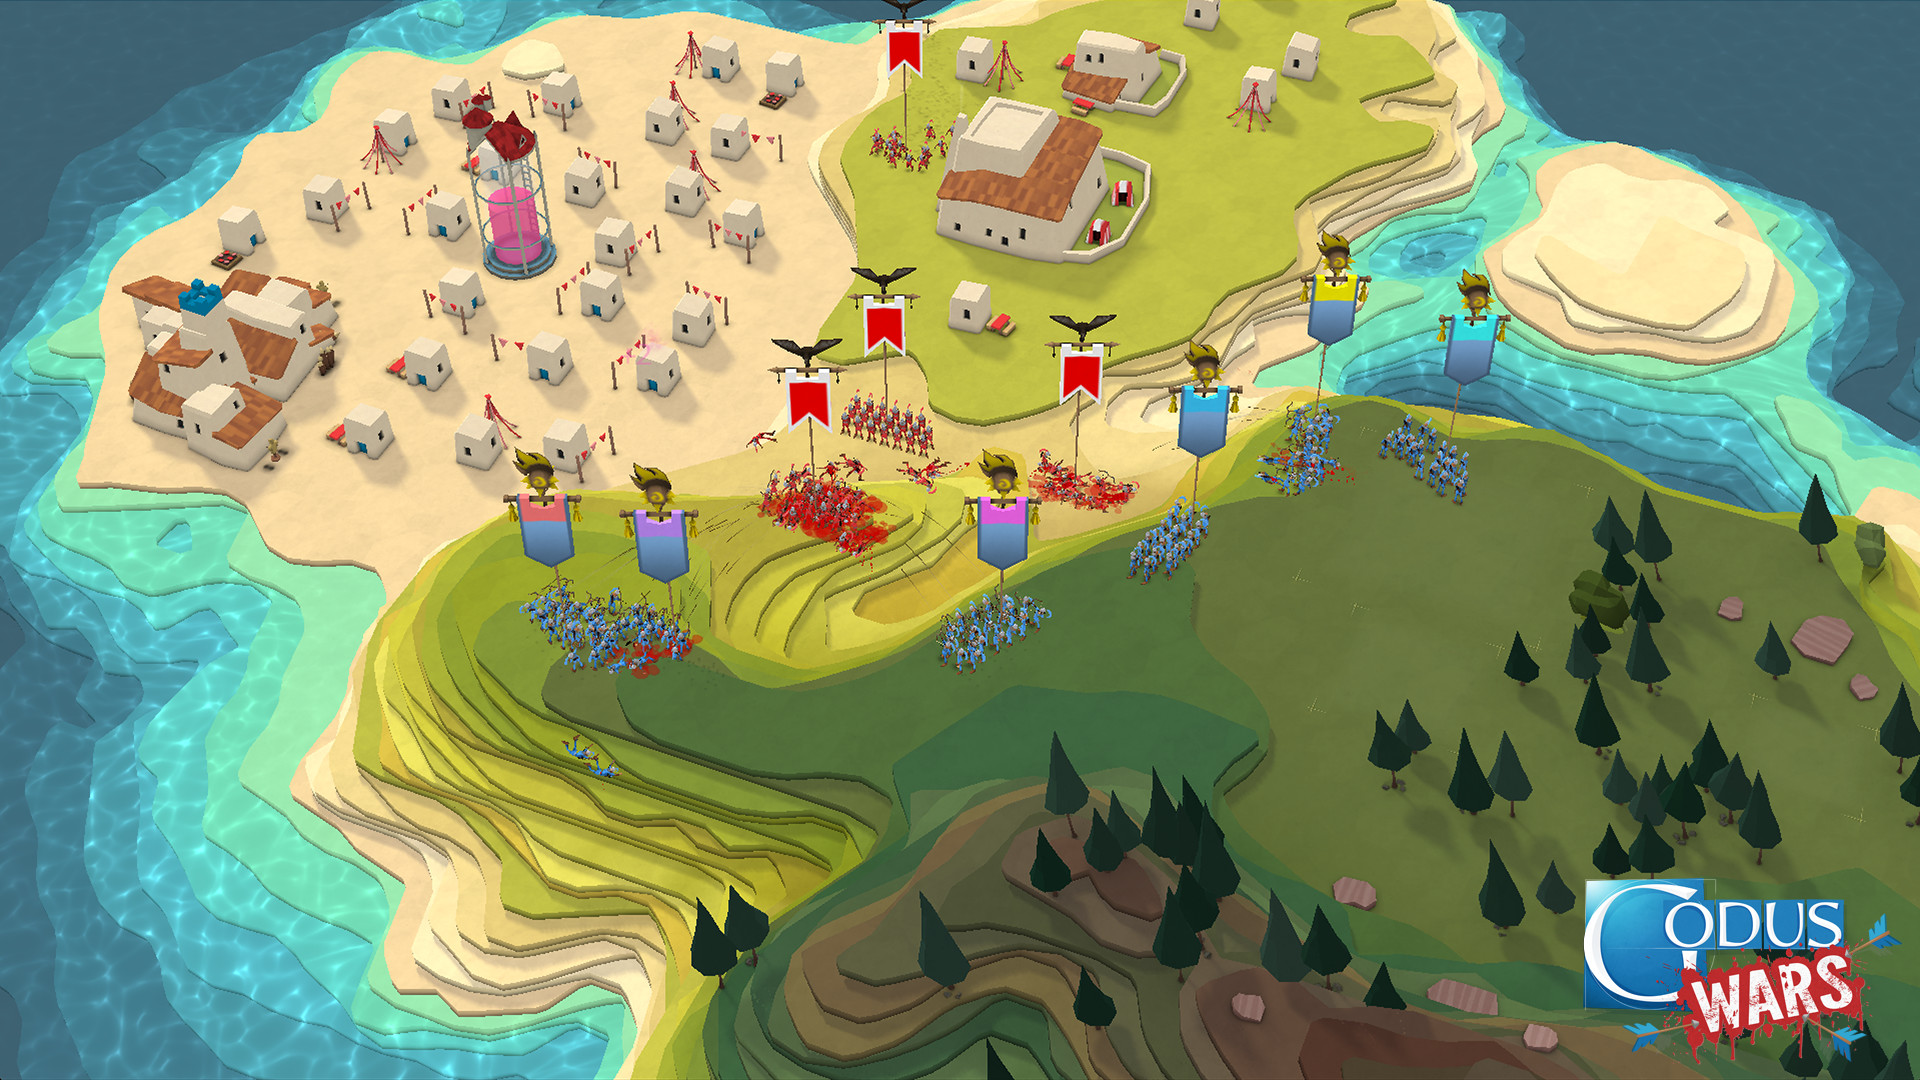 Download Godus Wars Full Pc Game